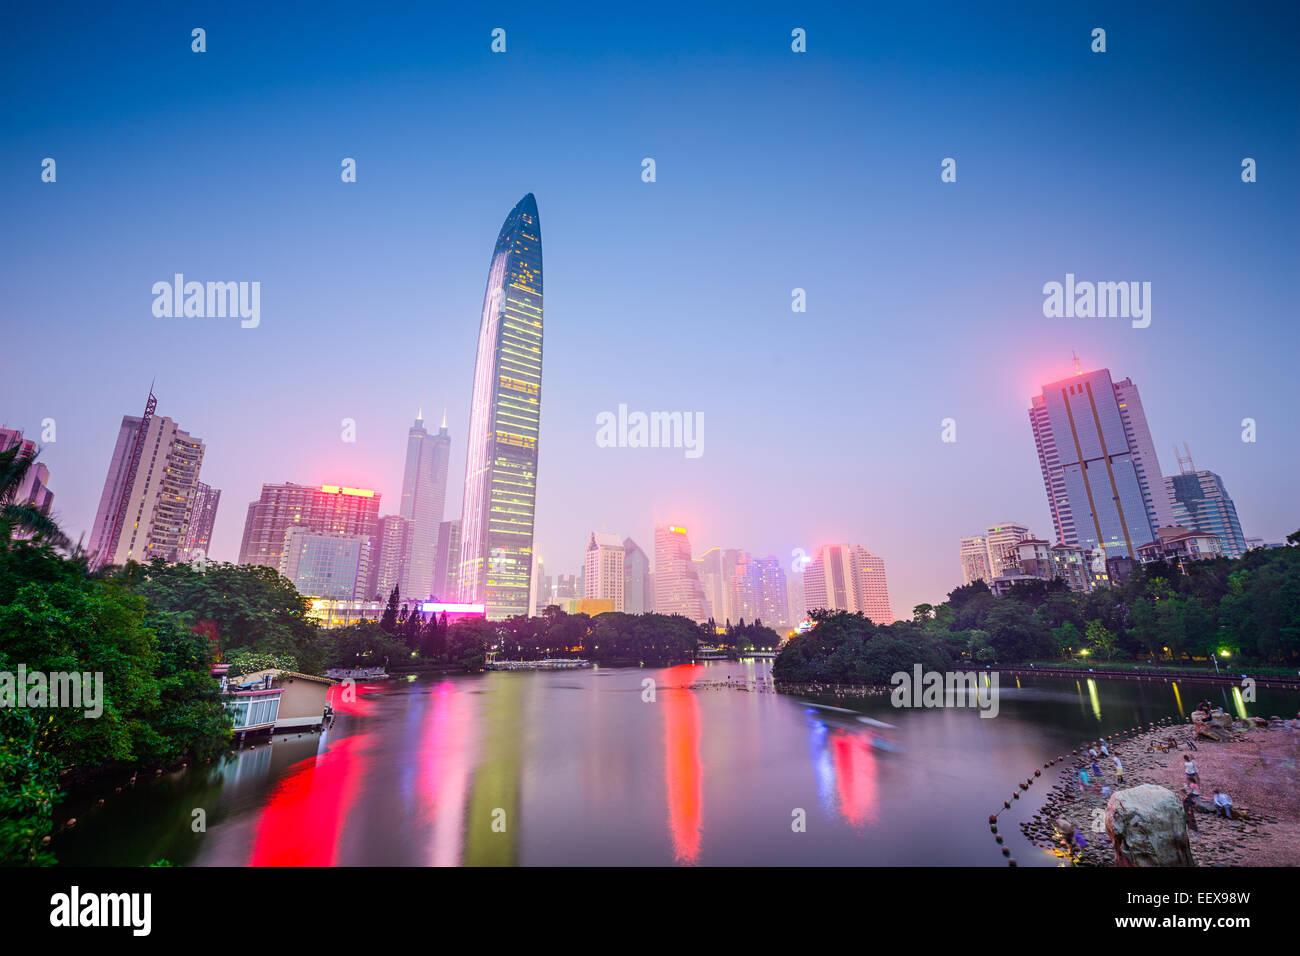 Shenzhen, China city skyline at Lychee Park. - Stock Image